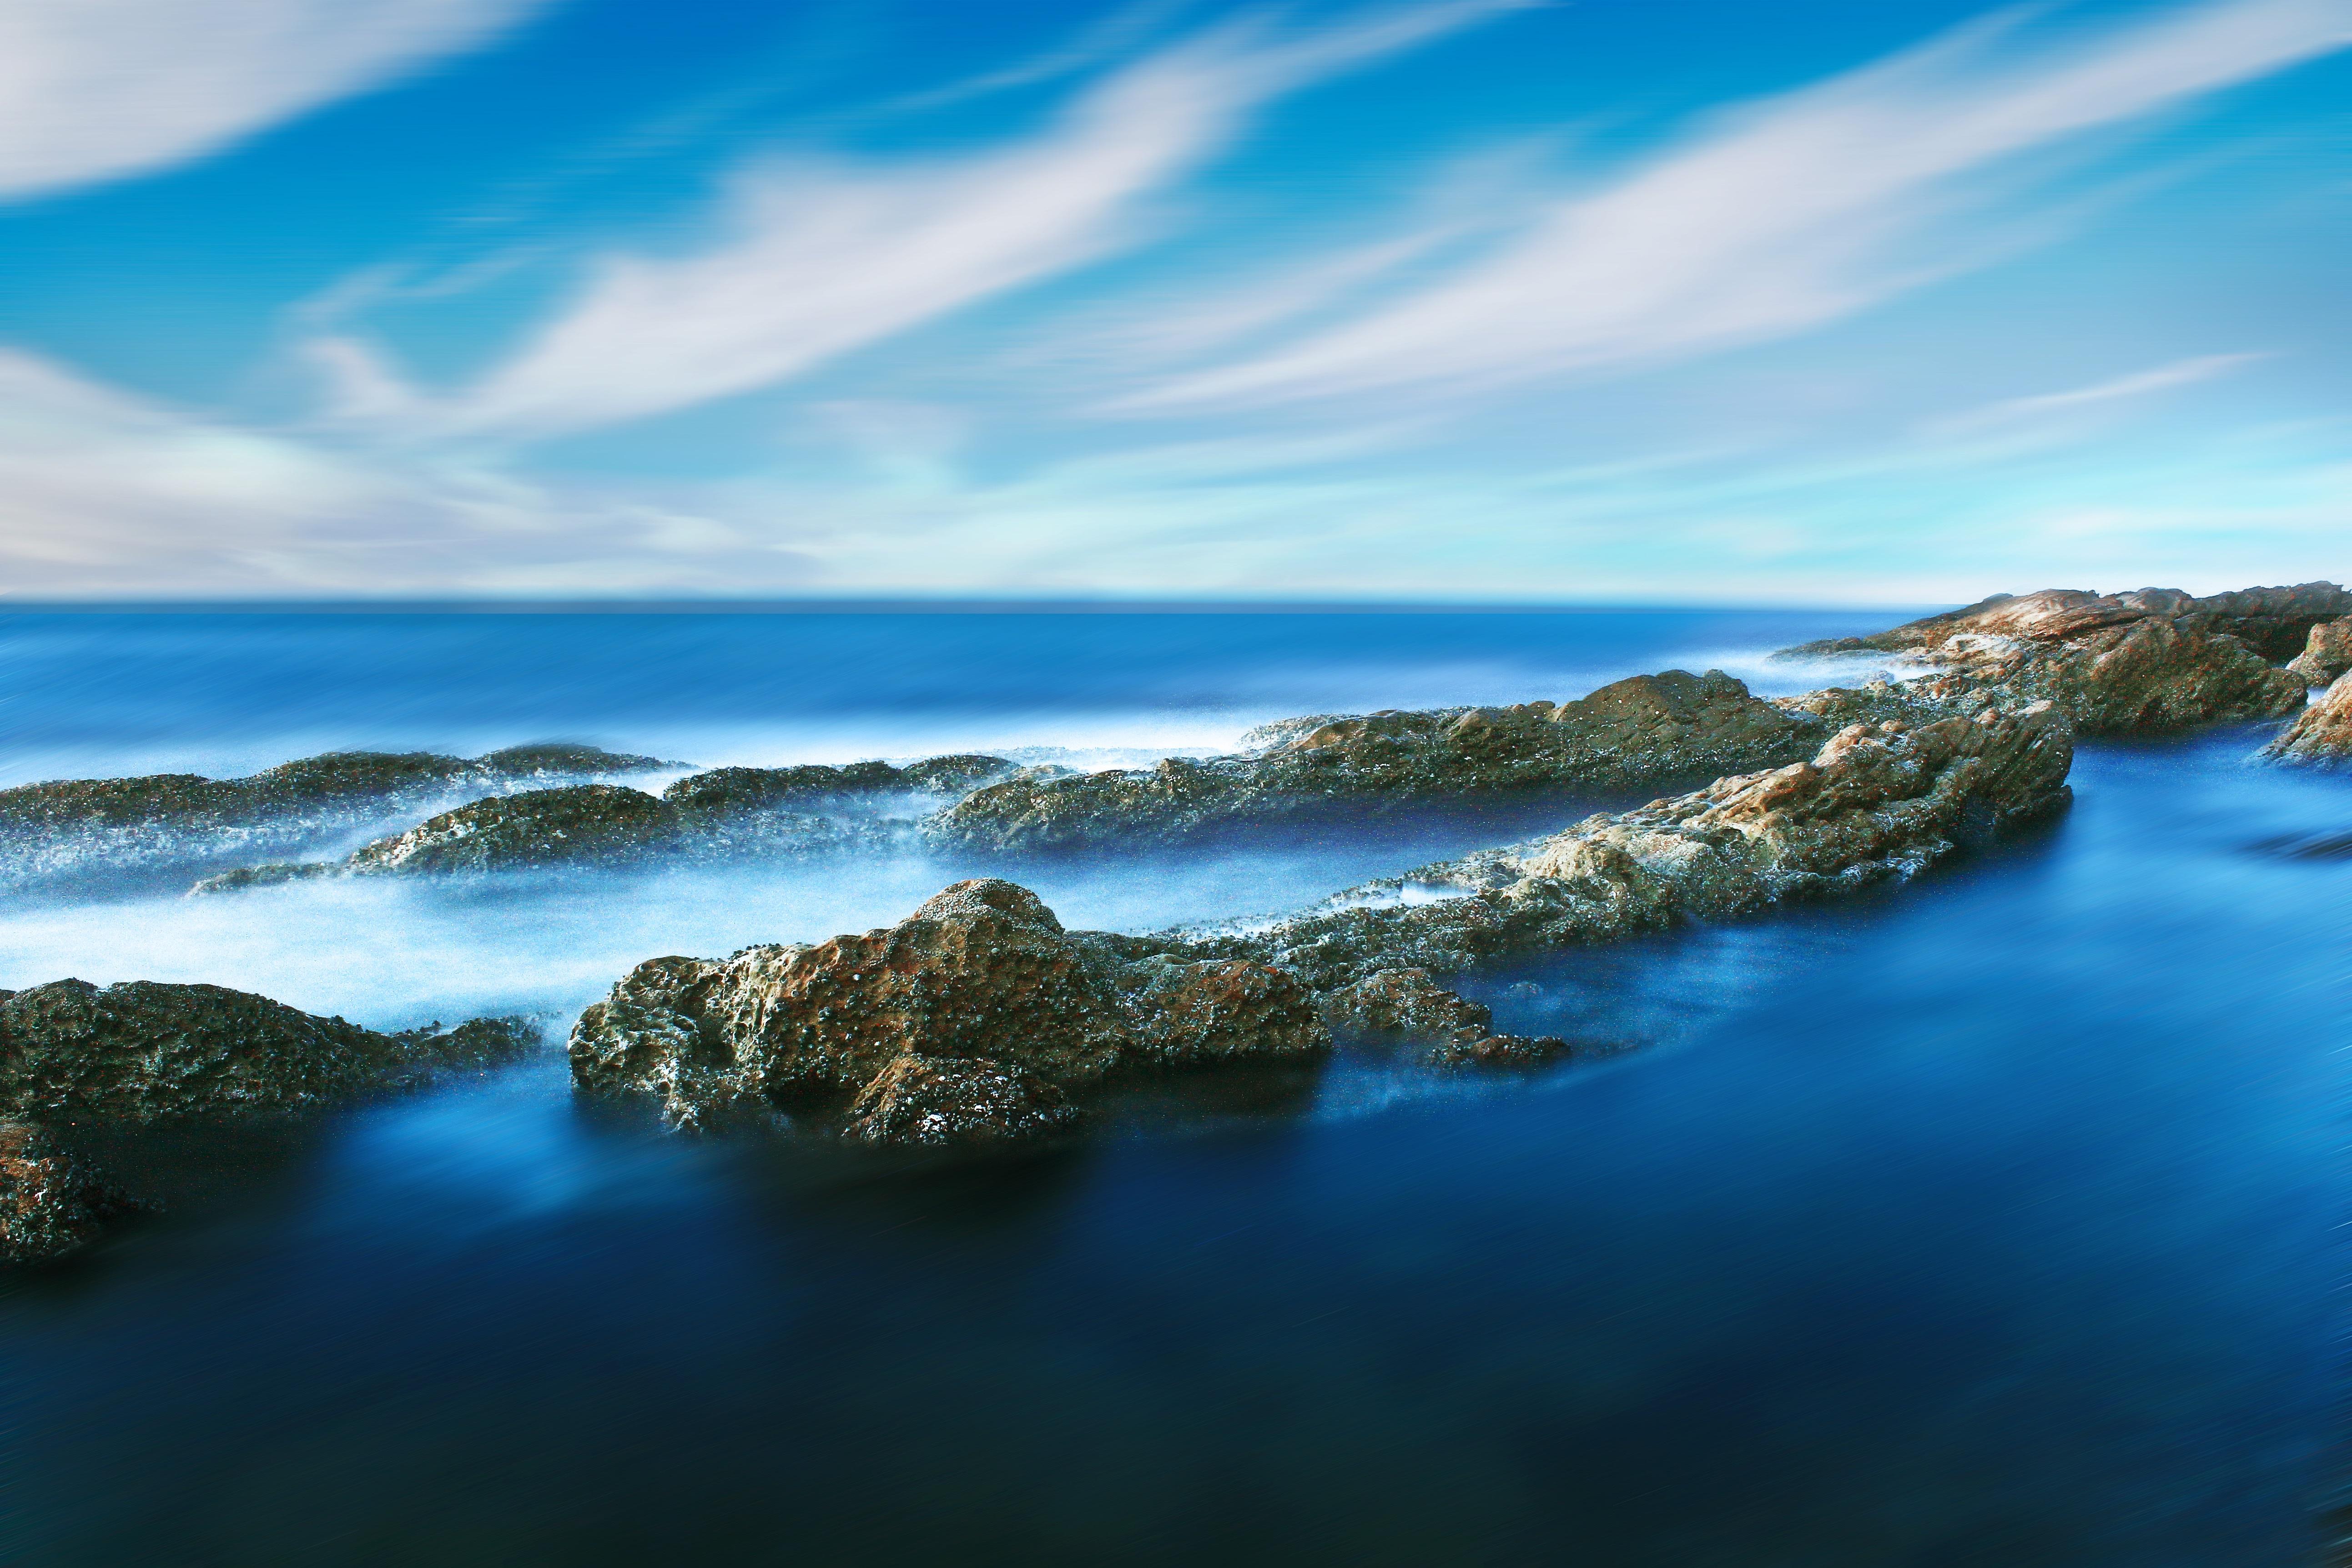 Wallpaper Pemandangan Tepi Pantai